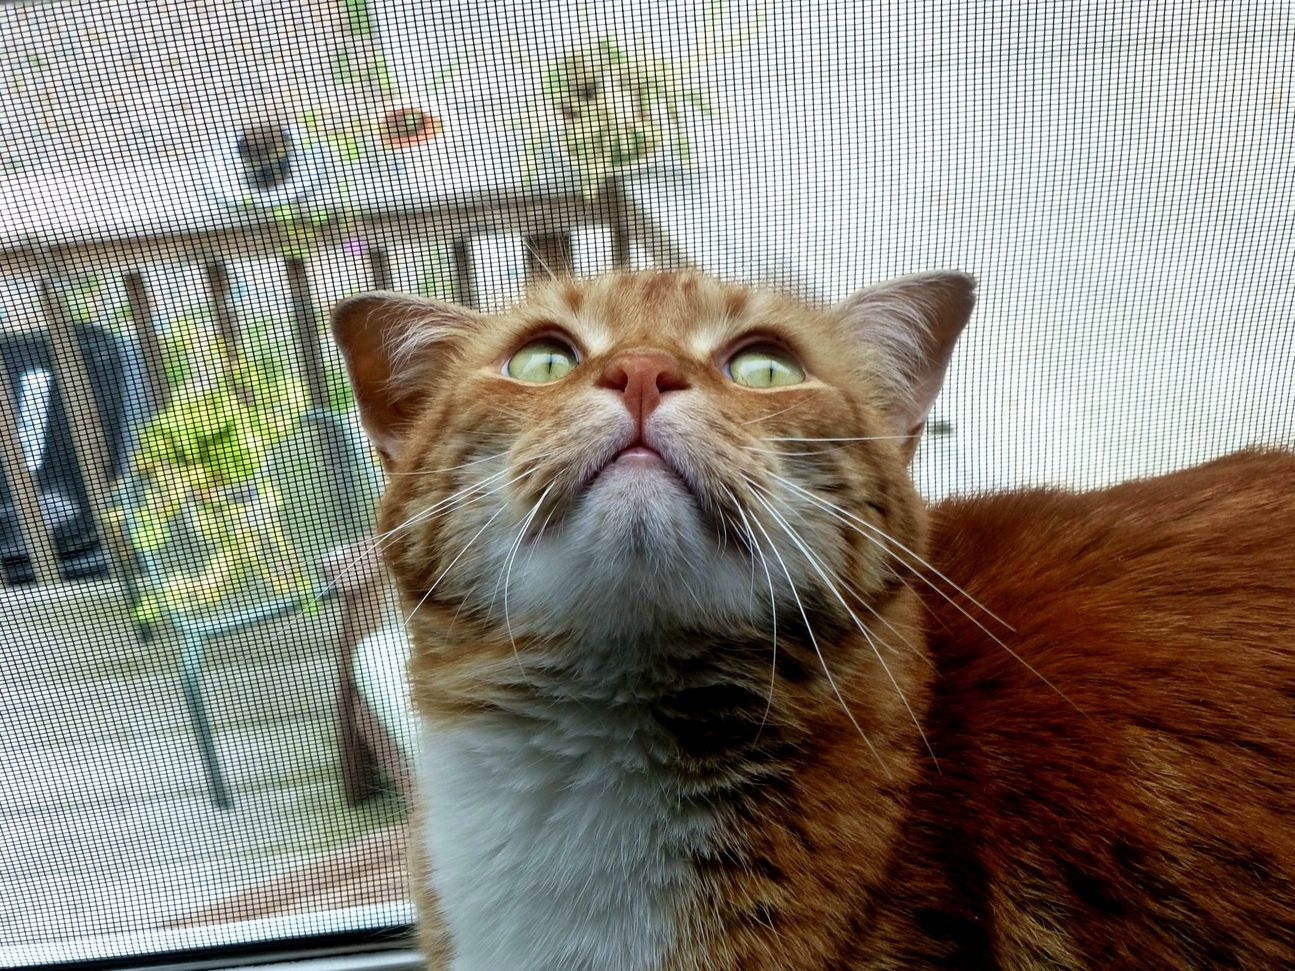 My cat focusing in a flattering pose